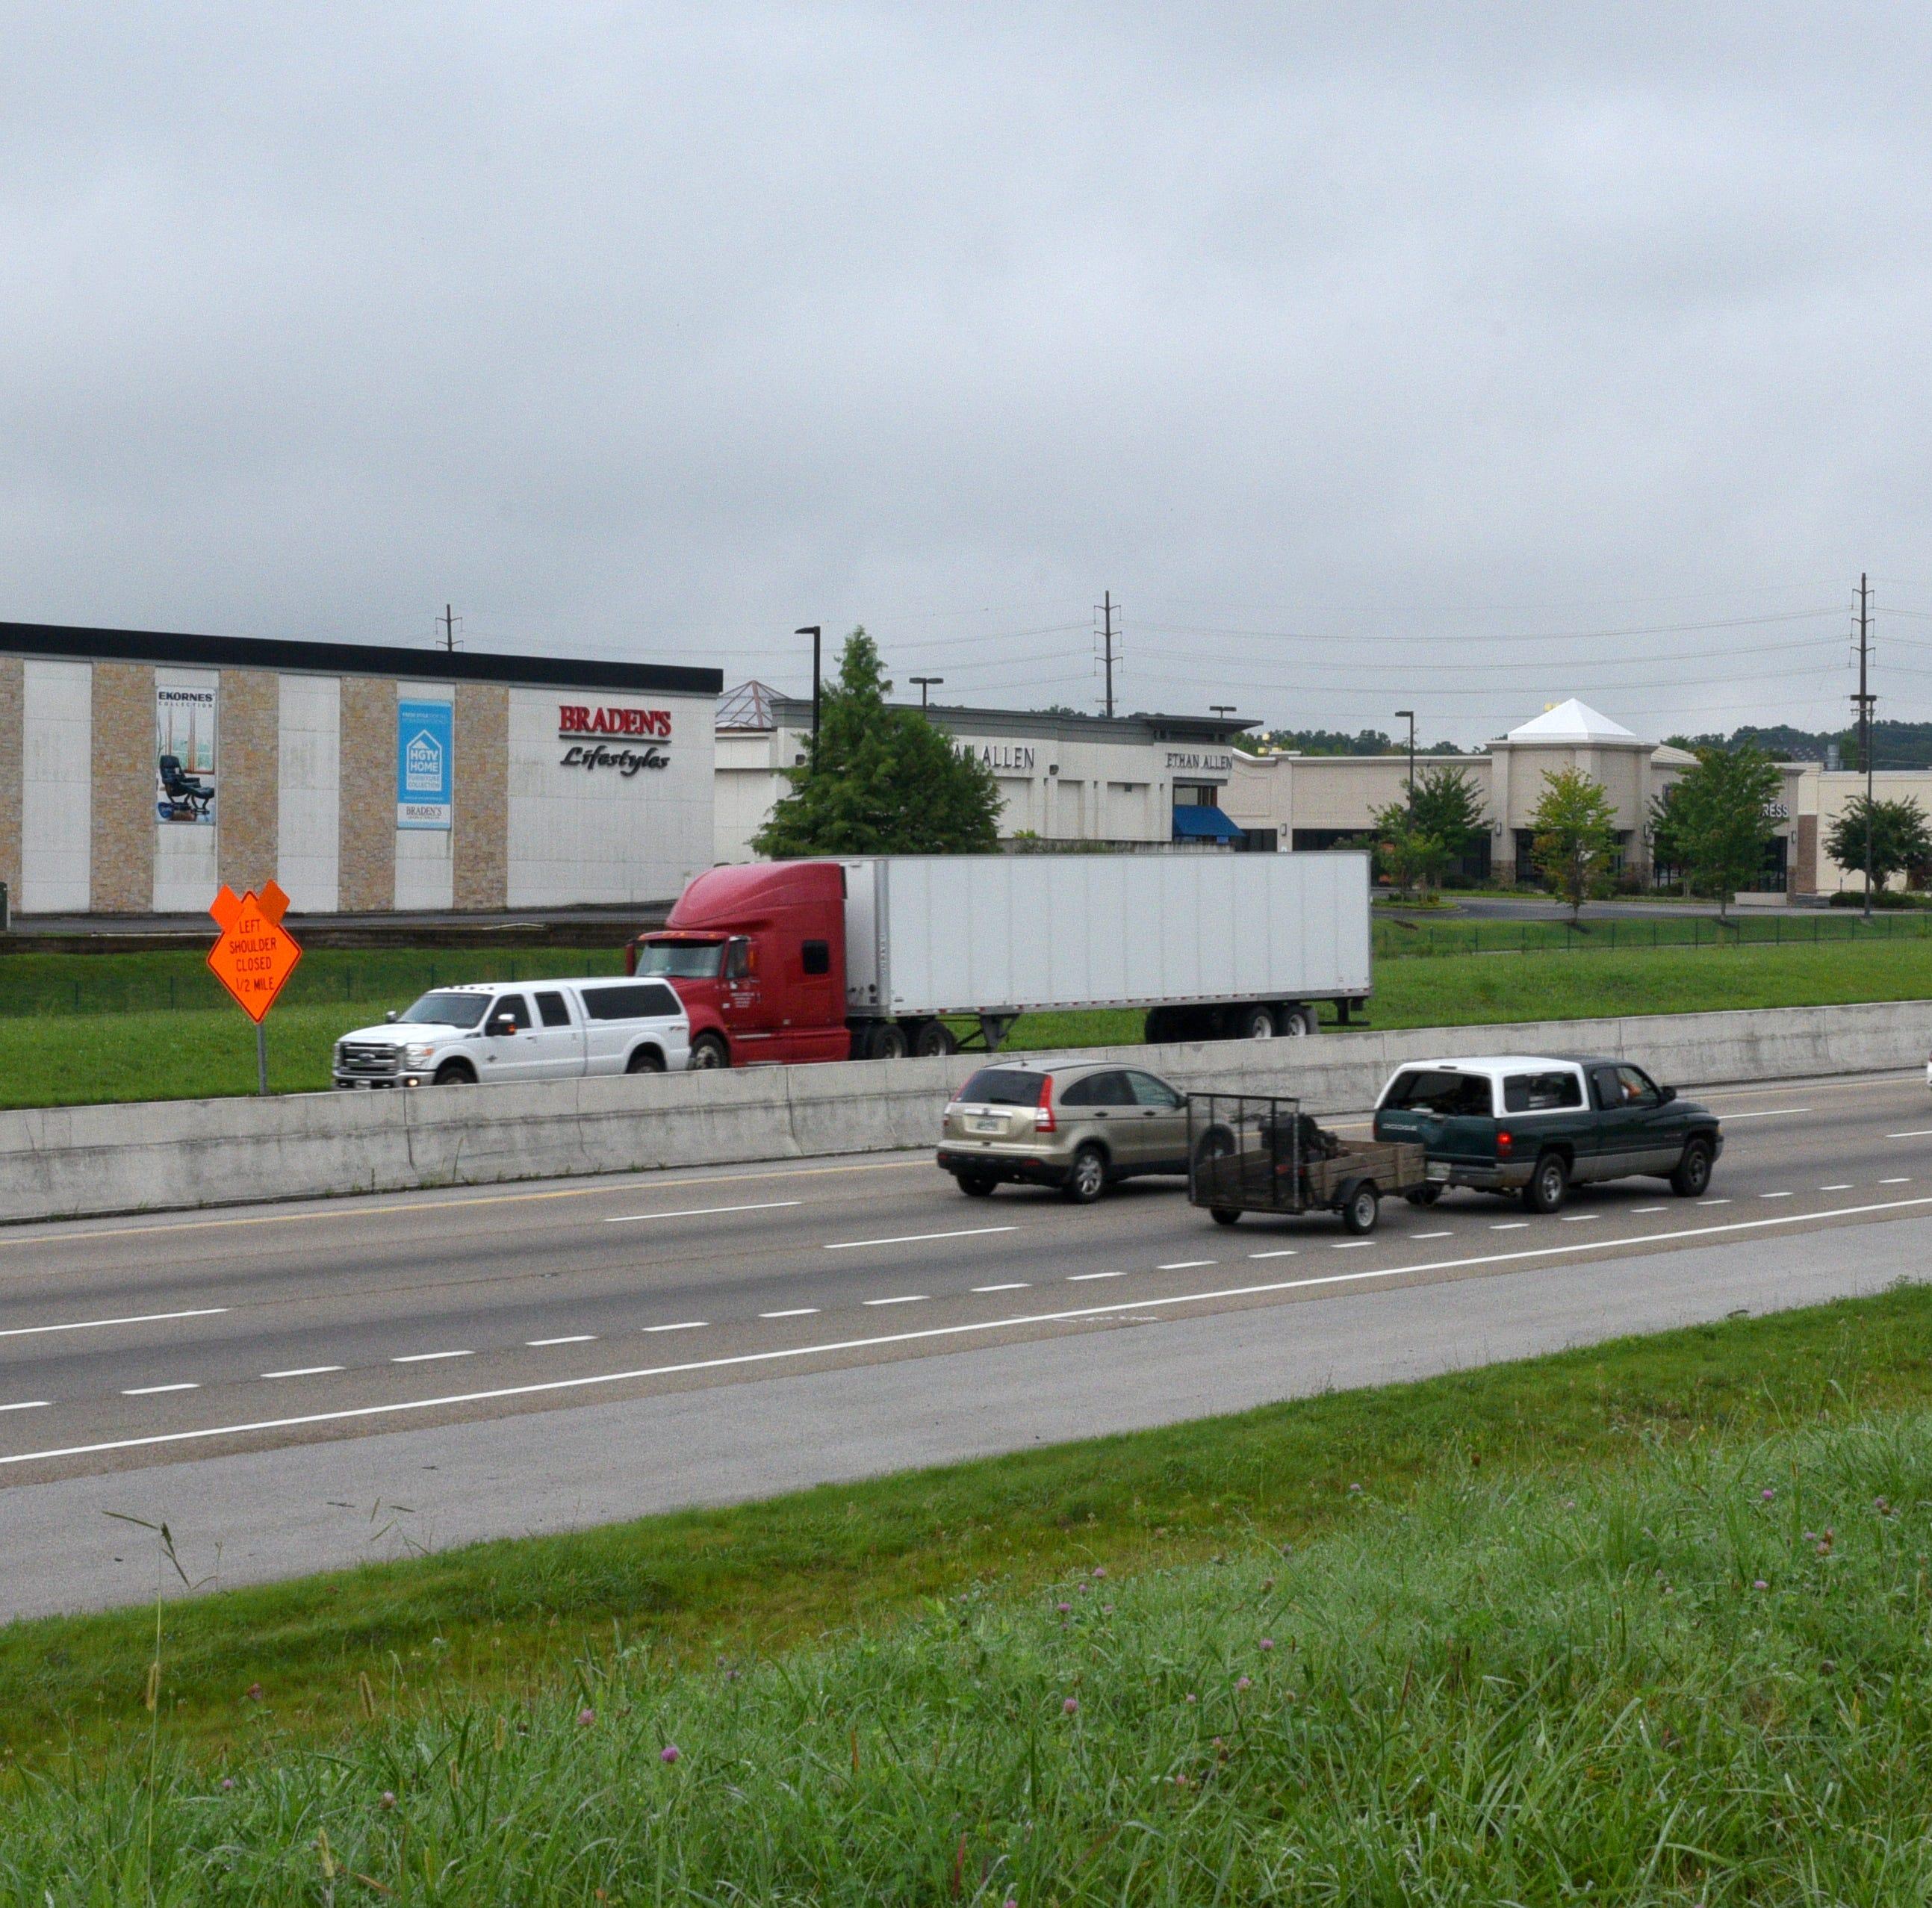 Outlet Drive development is next focus for Farragut, West Knoxville